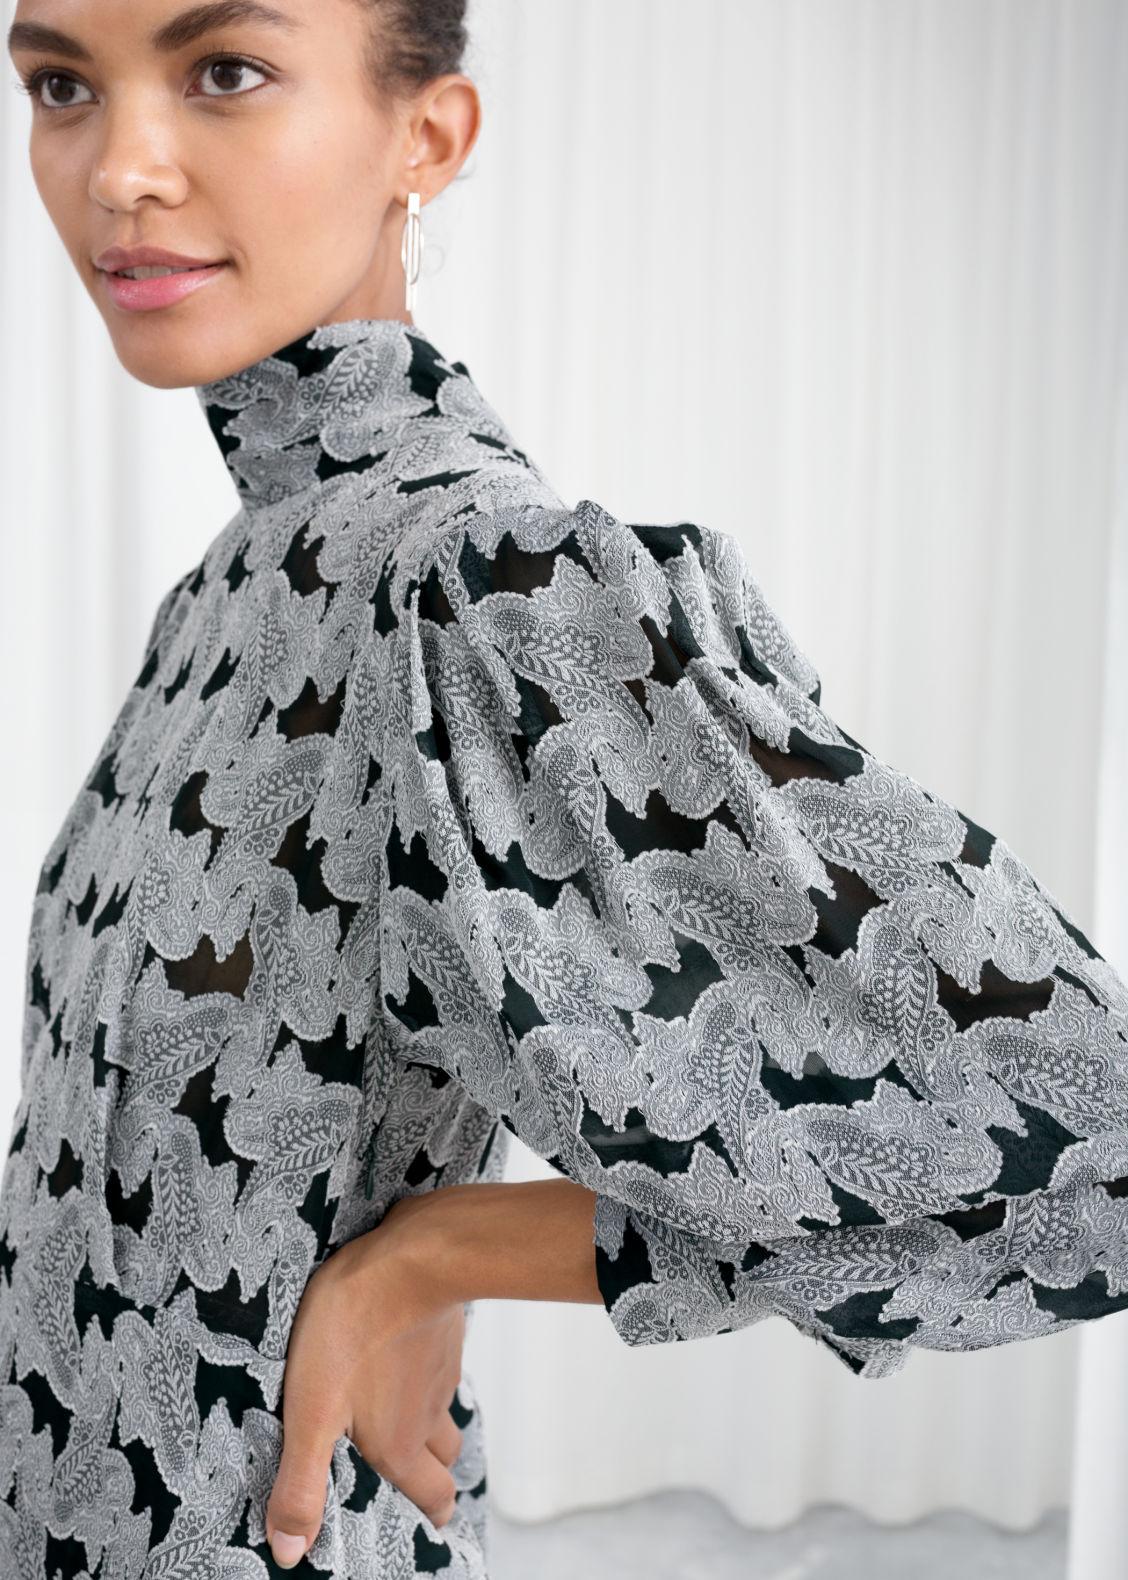 acafe2fa91 Turtleneck Jacquard Dress - Black - Printed dresses -   Other Stories